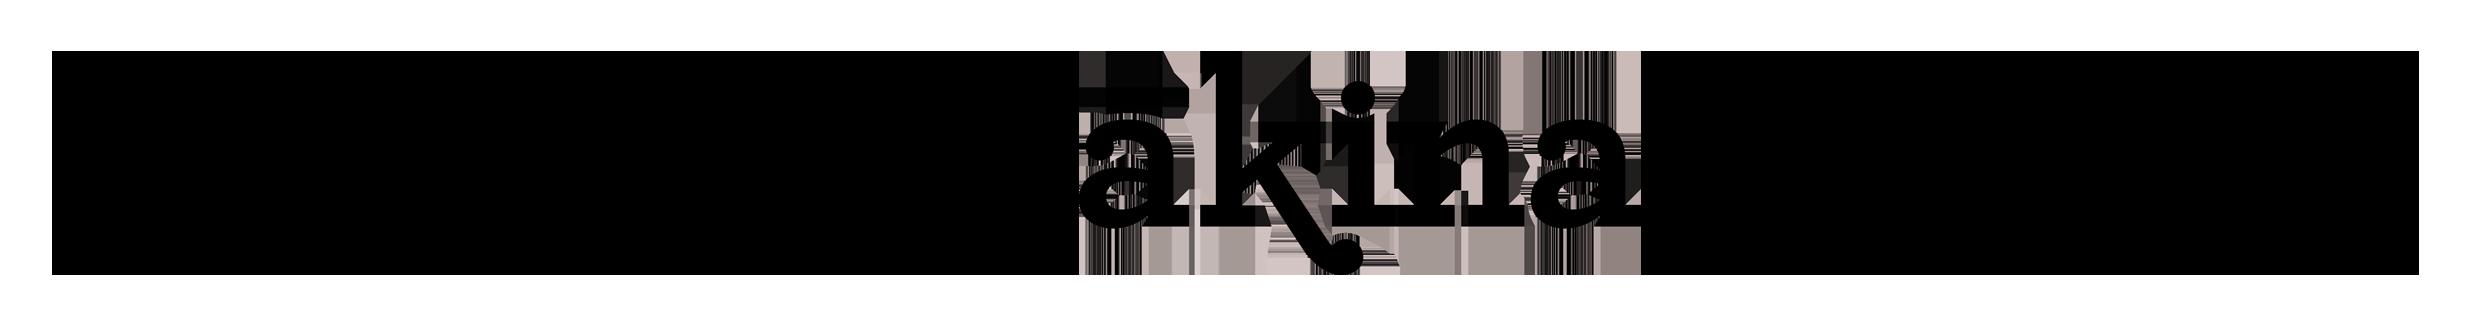 DIA_Ākina_Cent_Logo_Black.png